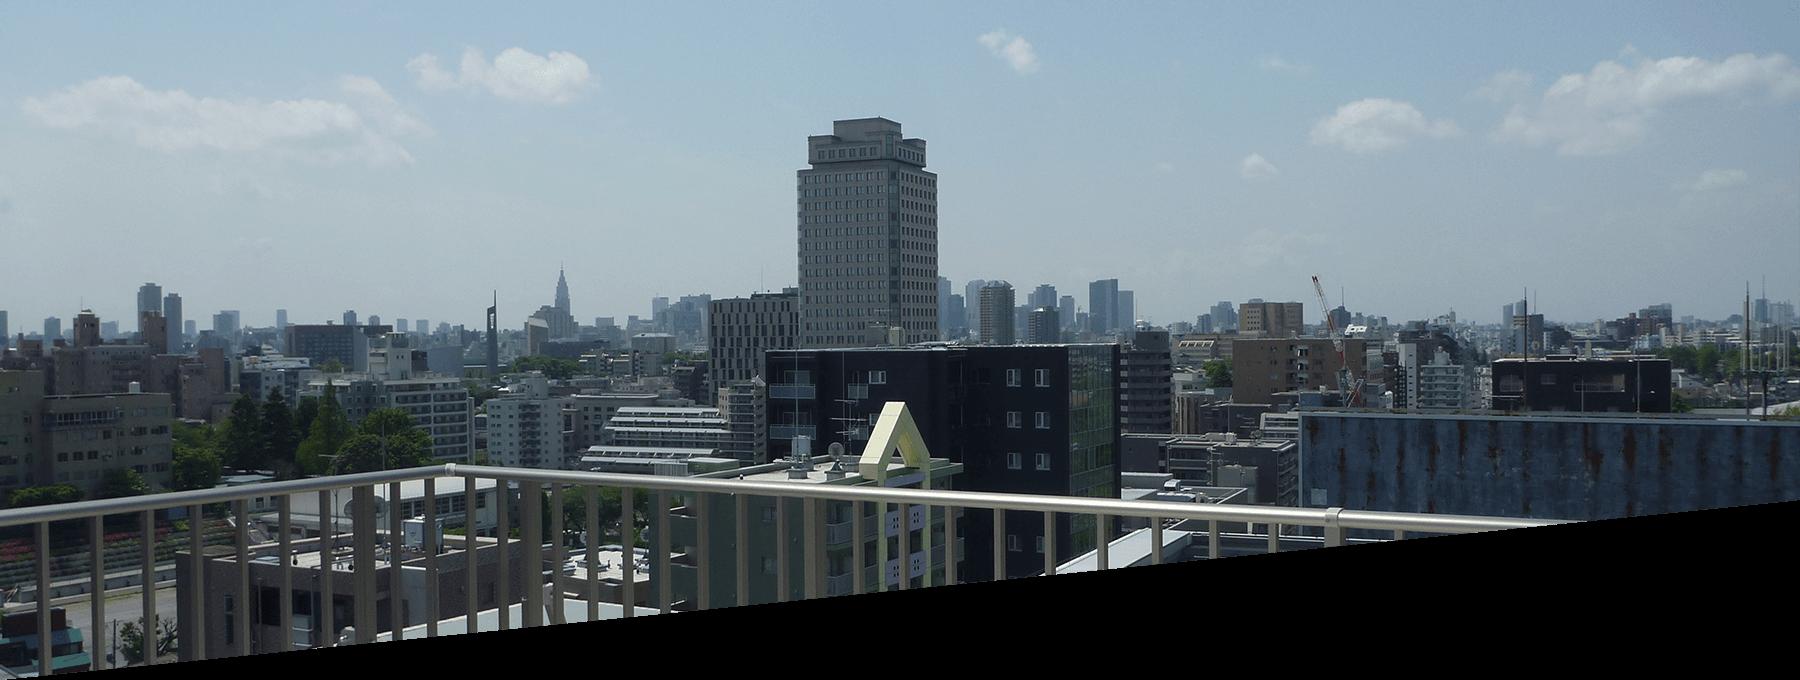 護国寺駅・新大塚駅より徒歩5分の女子学生寮『野村女子会館』